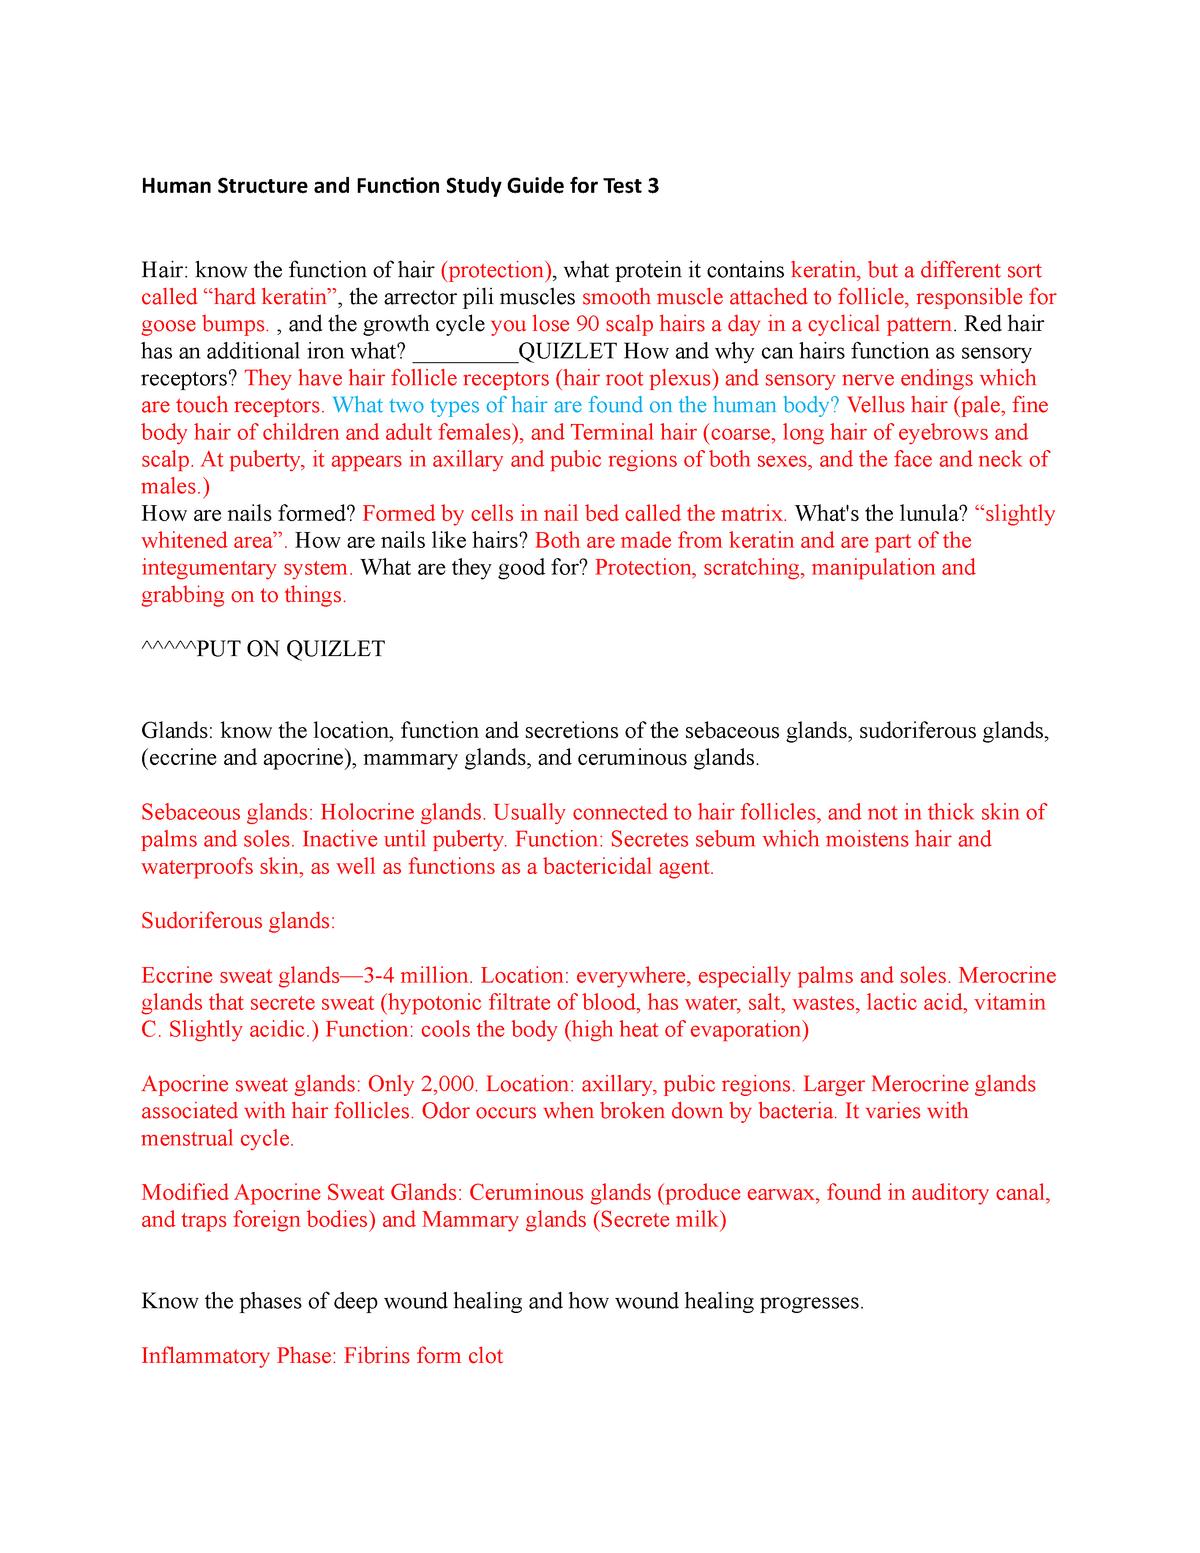 HSF 1 Study Guide Test 3 (Autosaved) - BIO 3223: Human